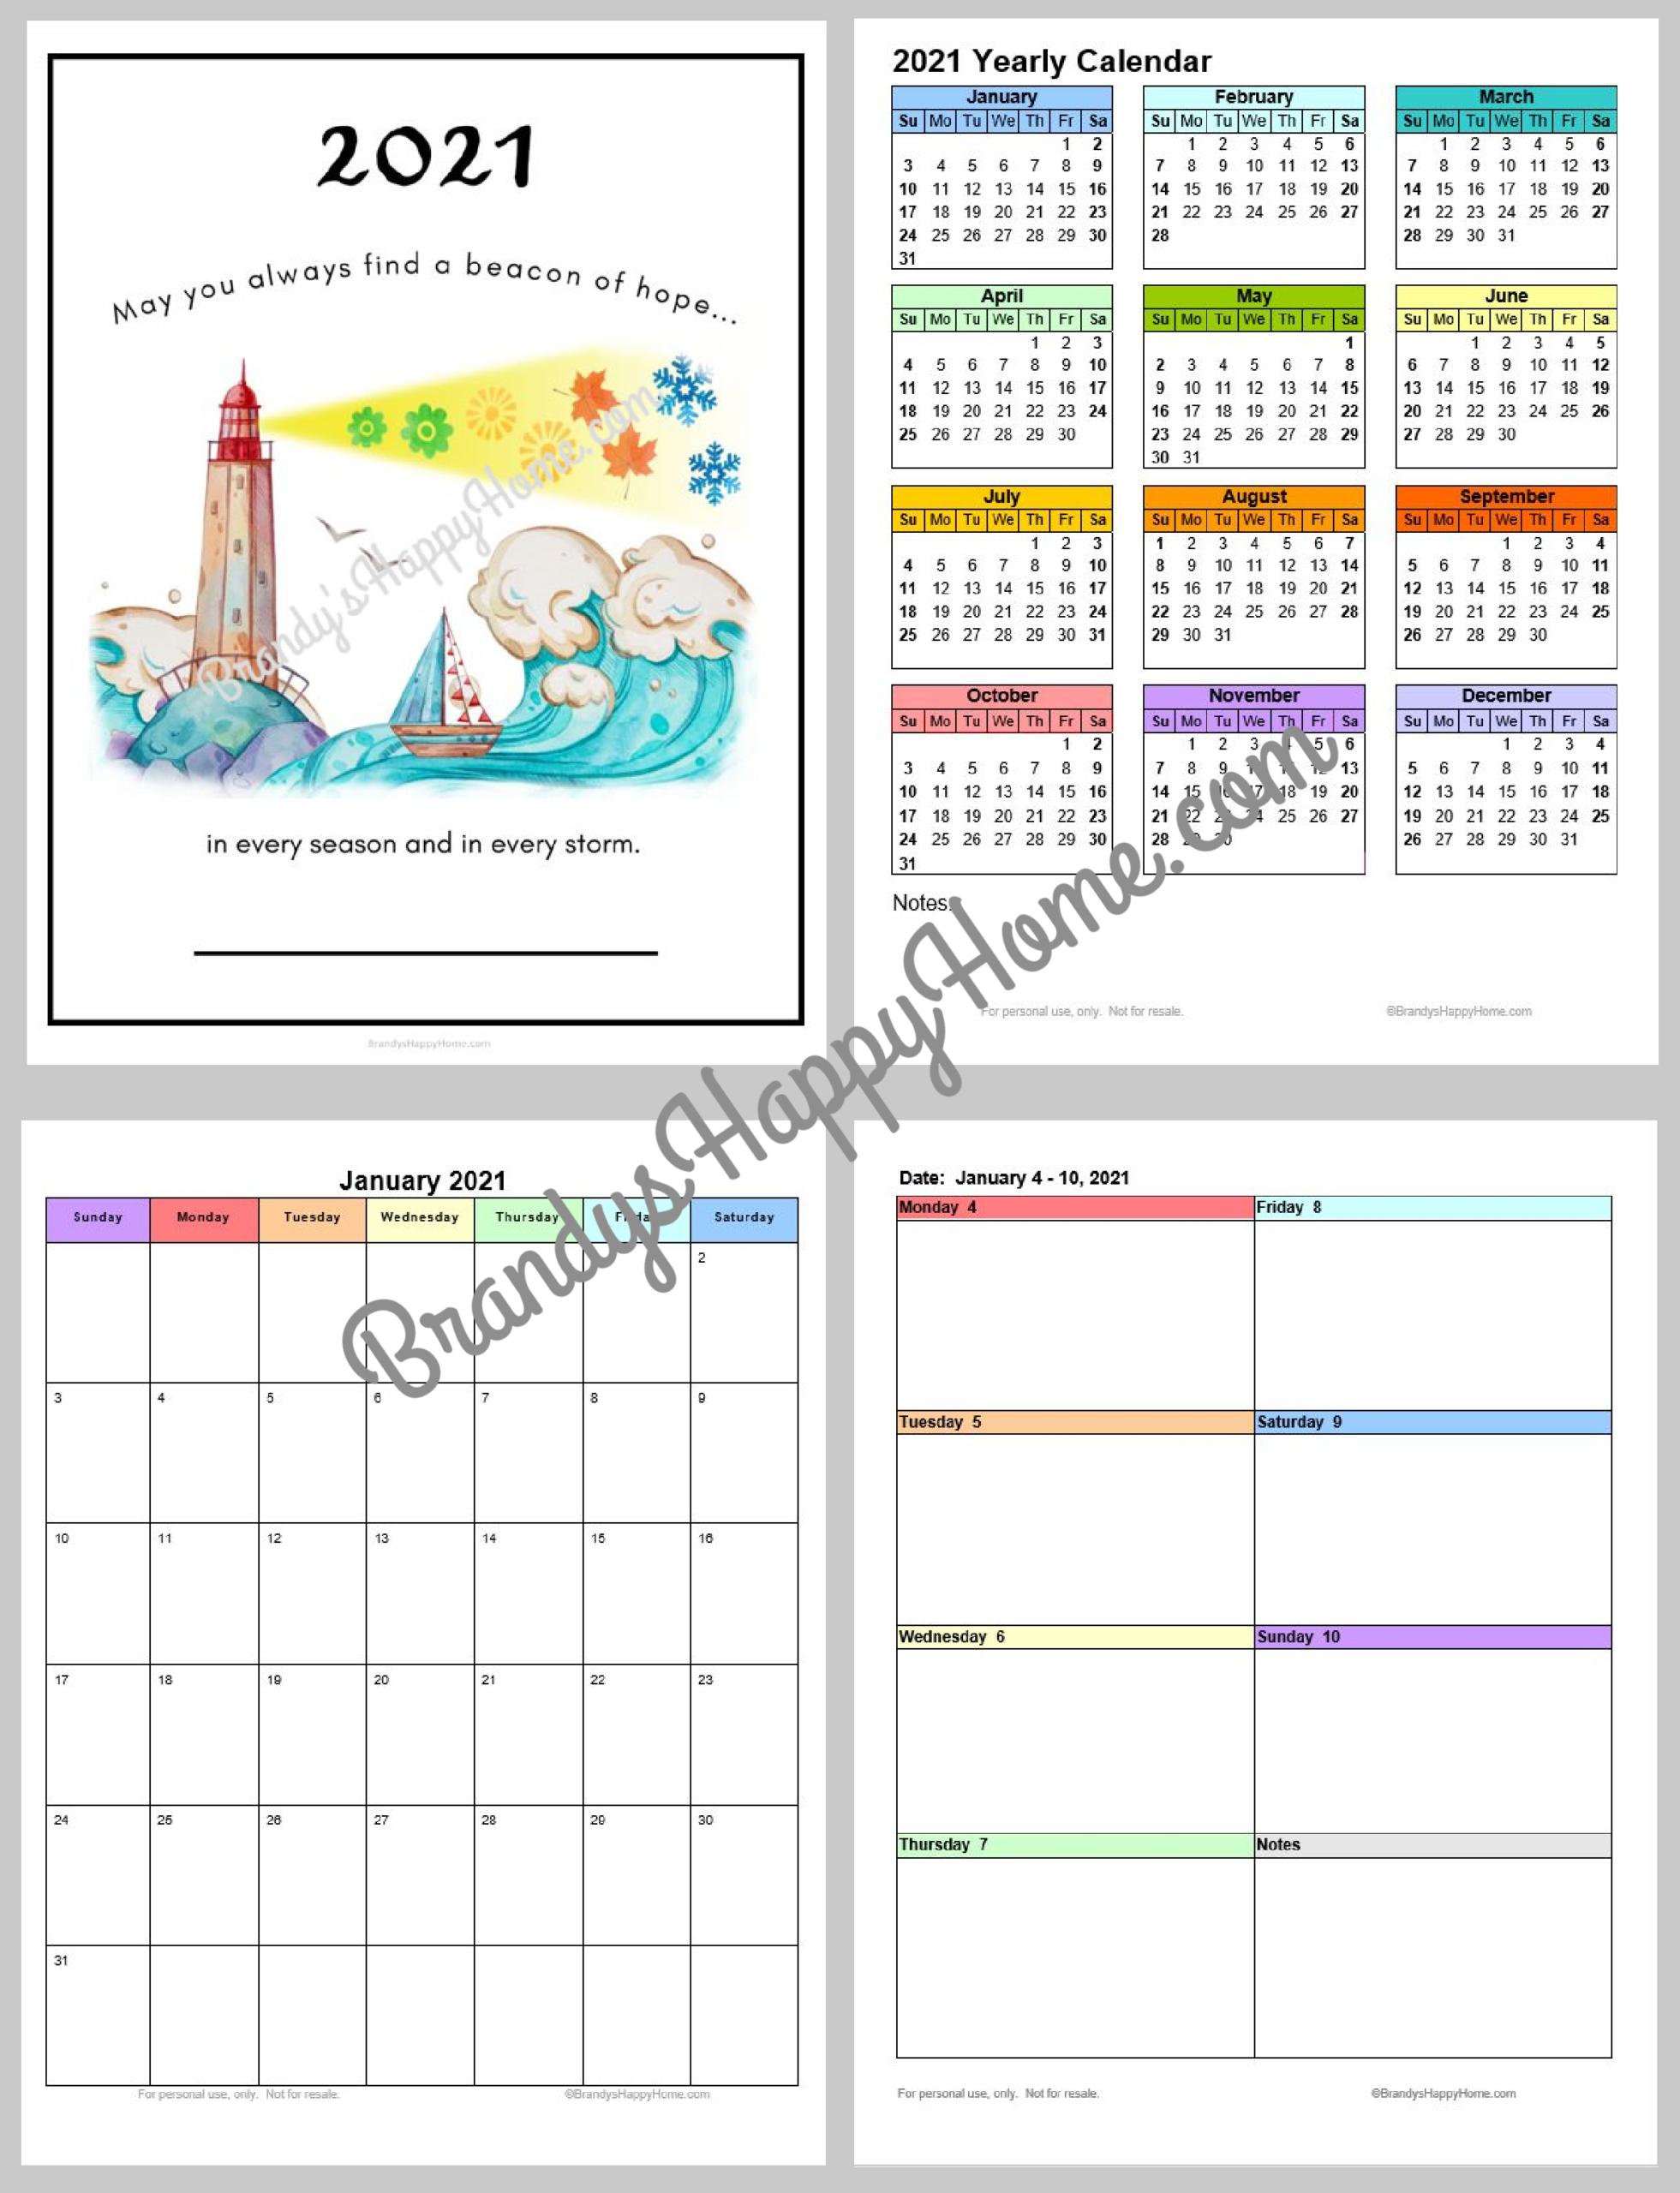 Free 2021 Calendar Planner Printables throughout Pocket Calendar 2021-2021: Two Year